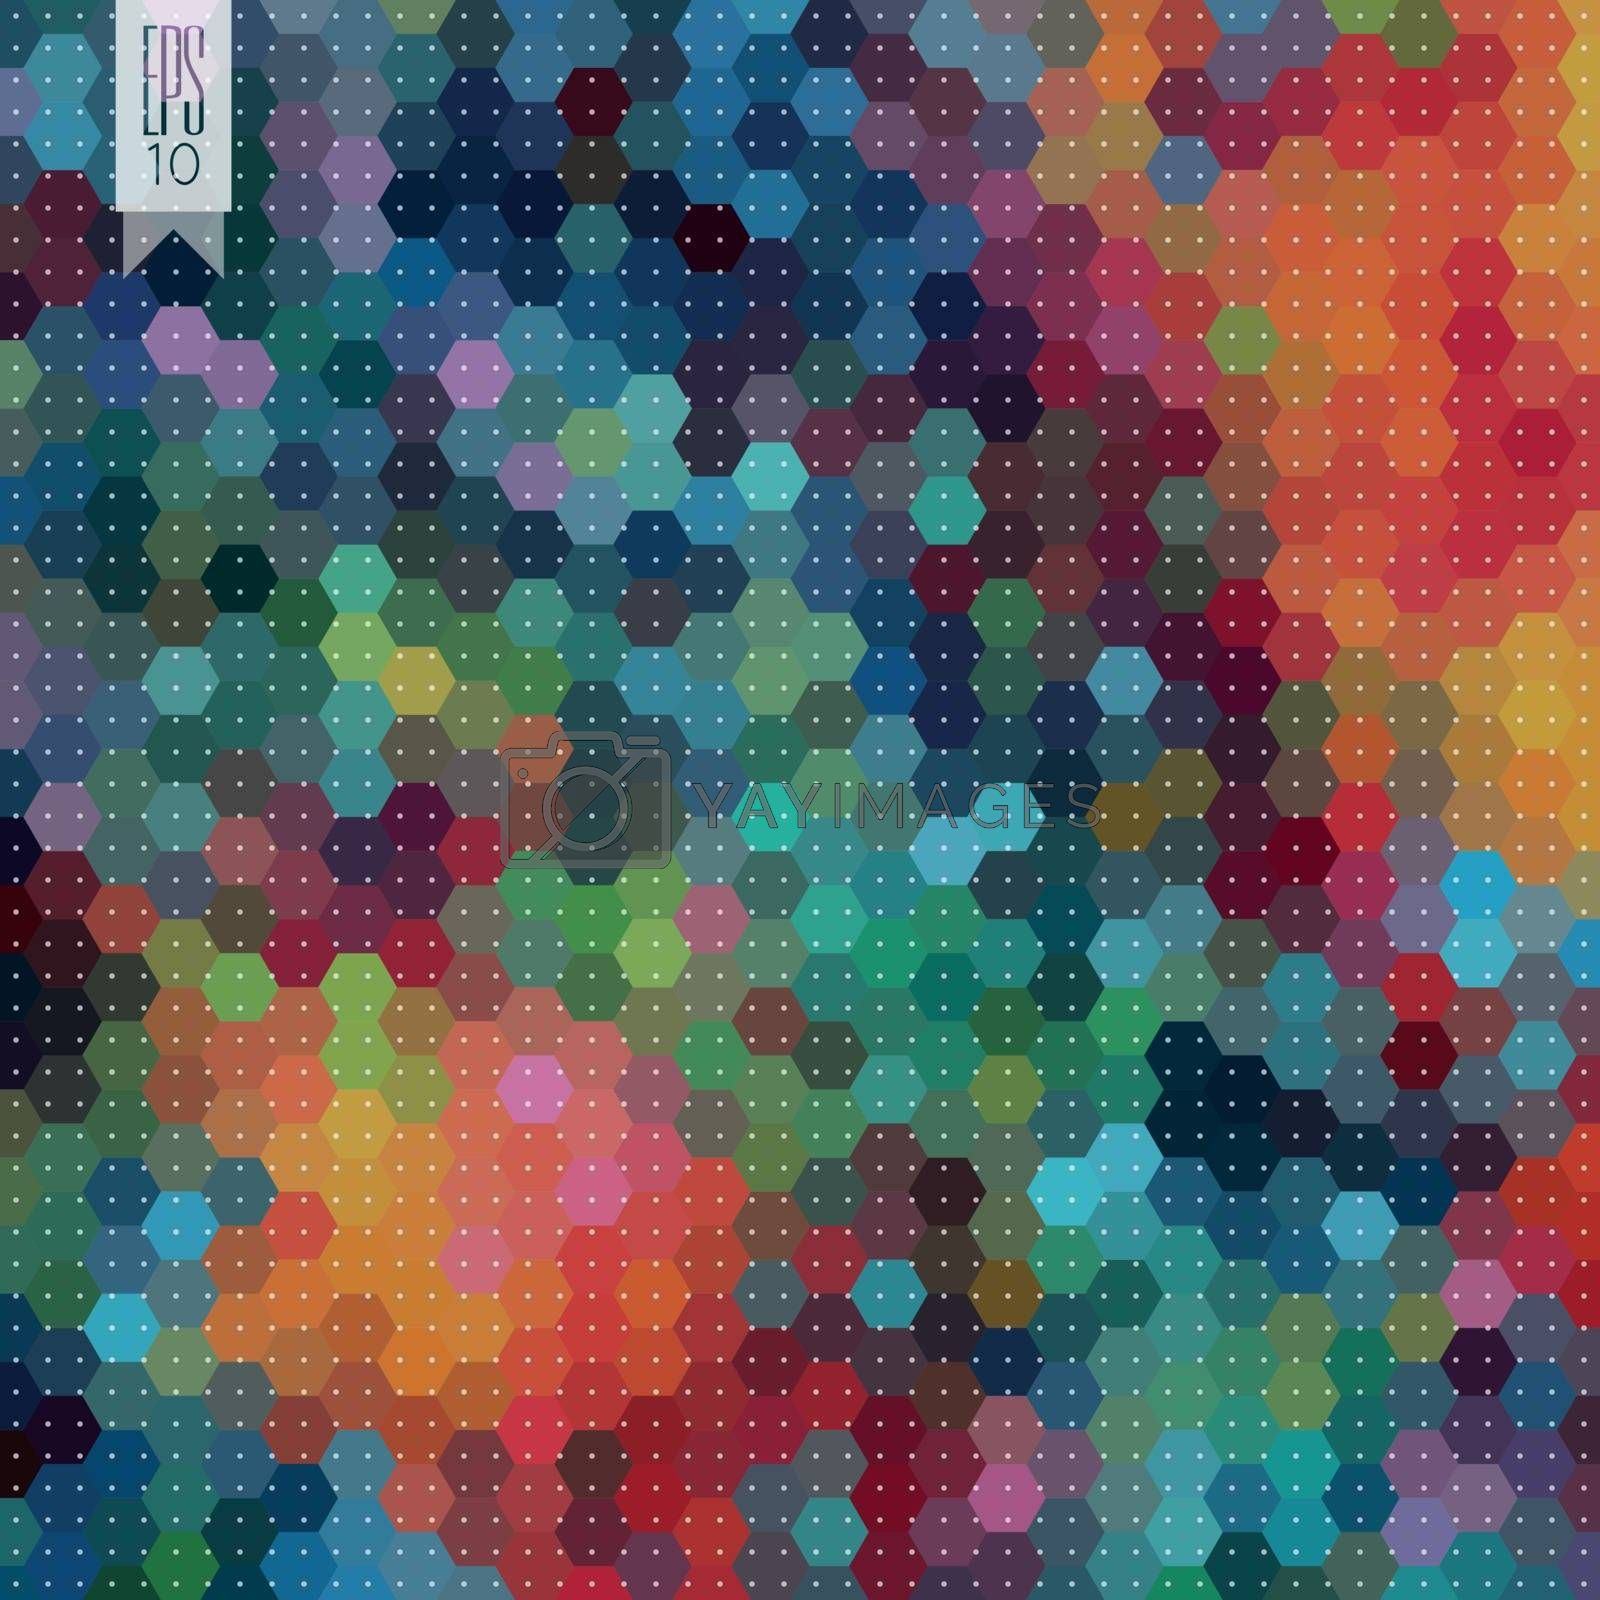 Hexagon background by kartyl